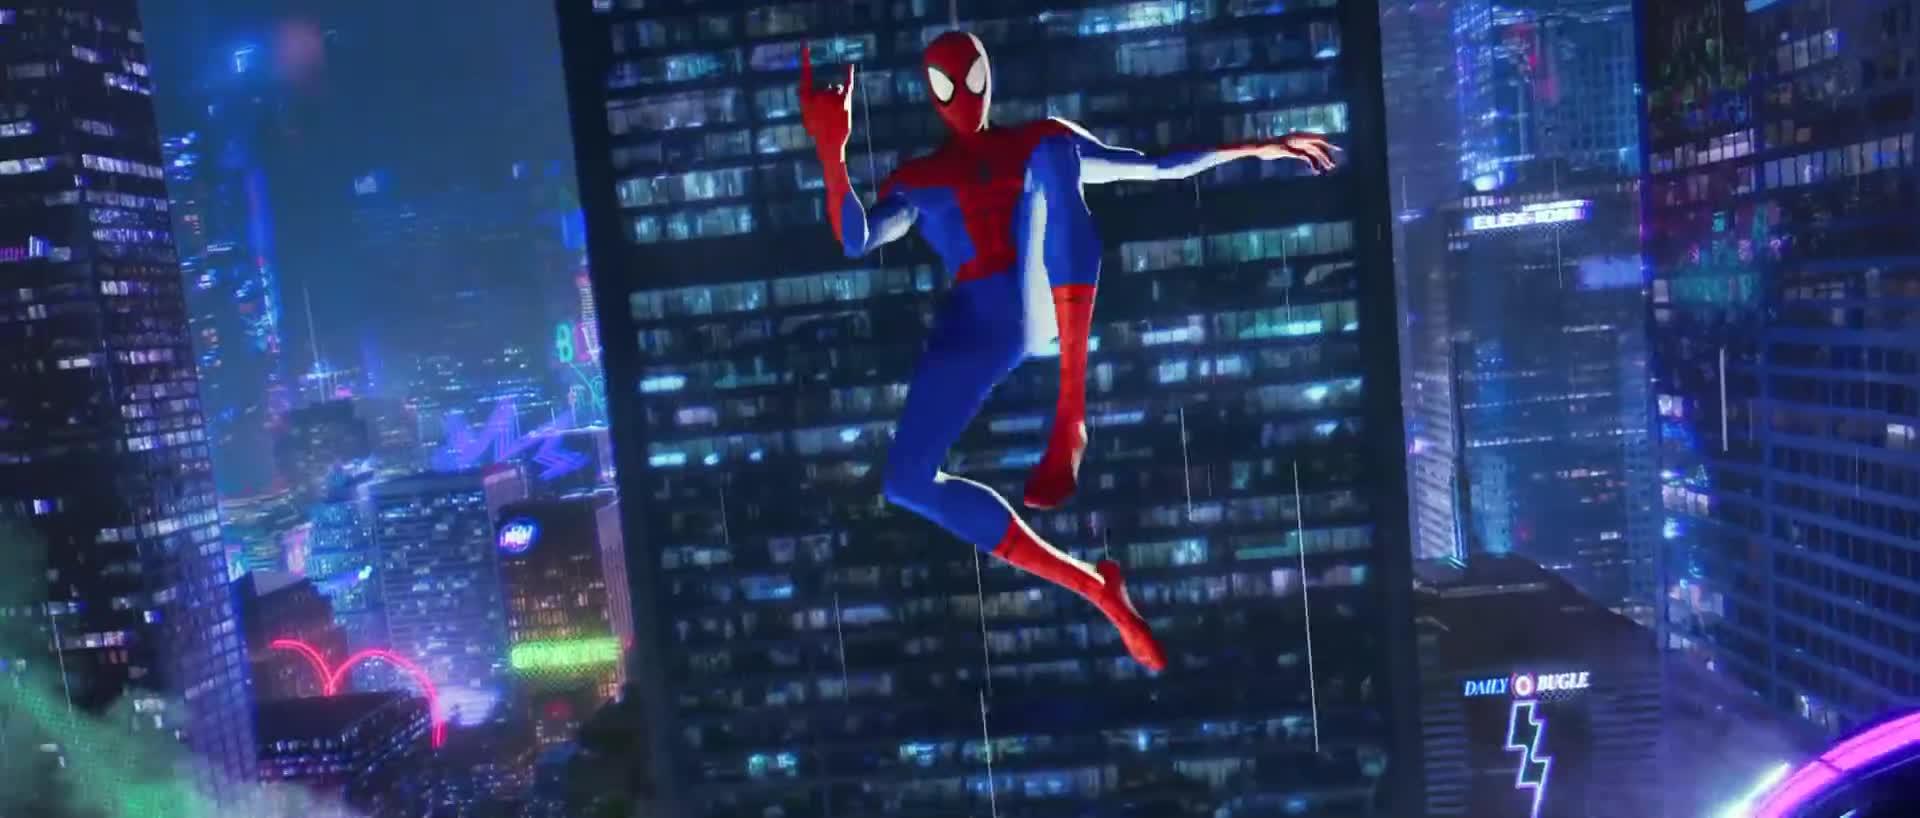 Spider-Man: A New Universe (2018) | Film, Trailer, Kritik